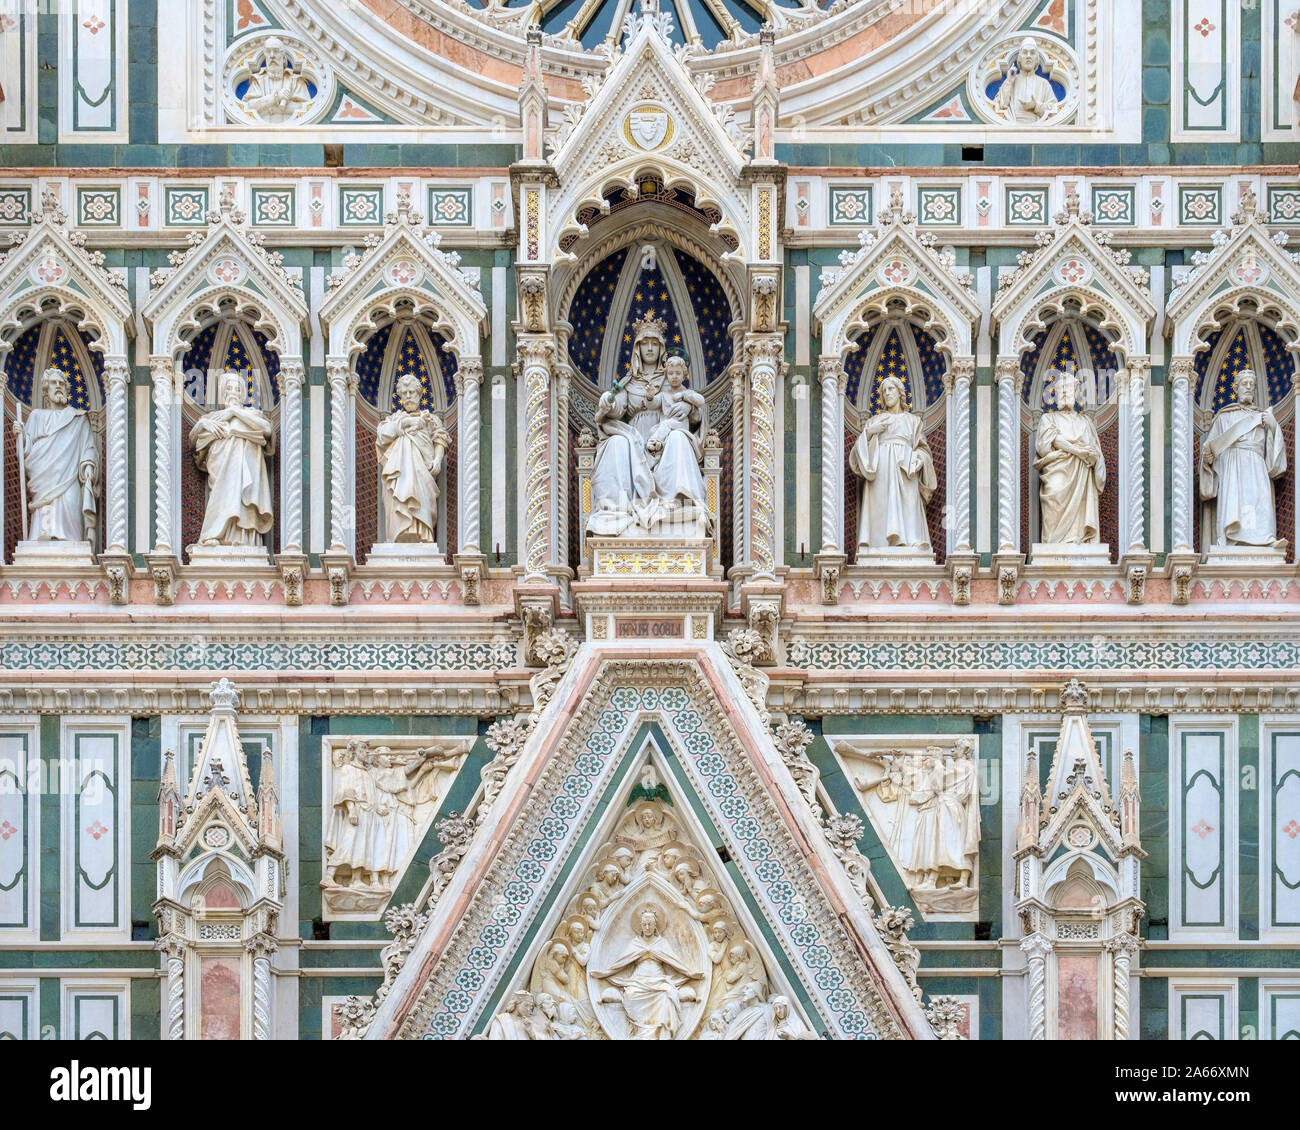 Renacimiento gótico façade (detalle) de la Catedral de Florencia (Duomo di Firenze). Sitio de Patrimonio Mundial de la UNESCO, Florencia (Firenze), Toscana, Italia, Europa. Foto de stock